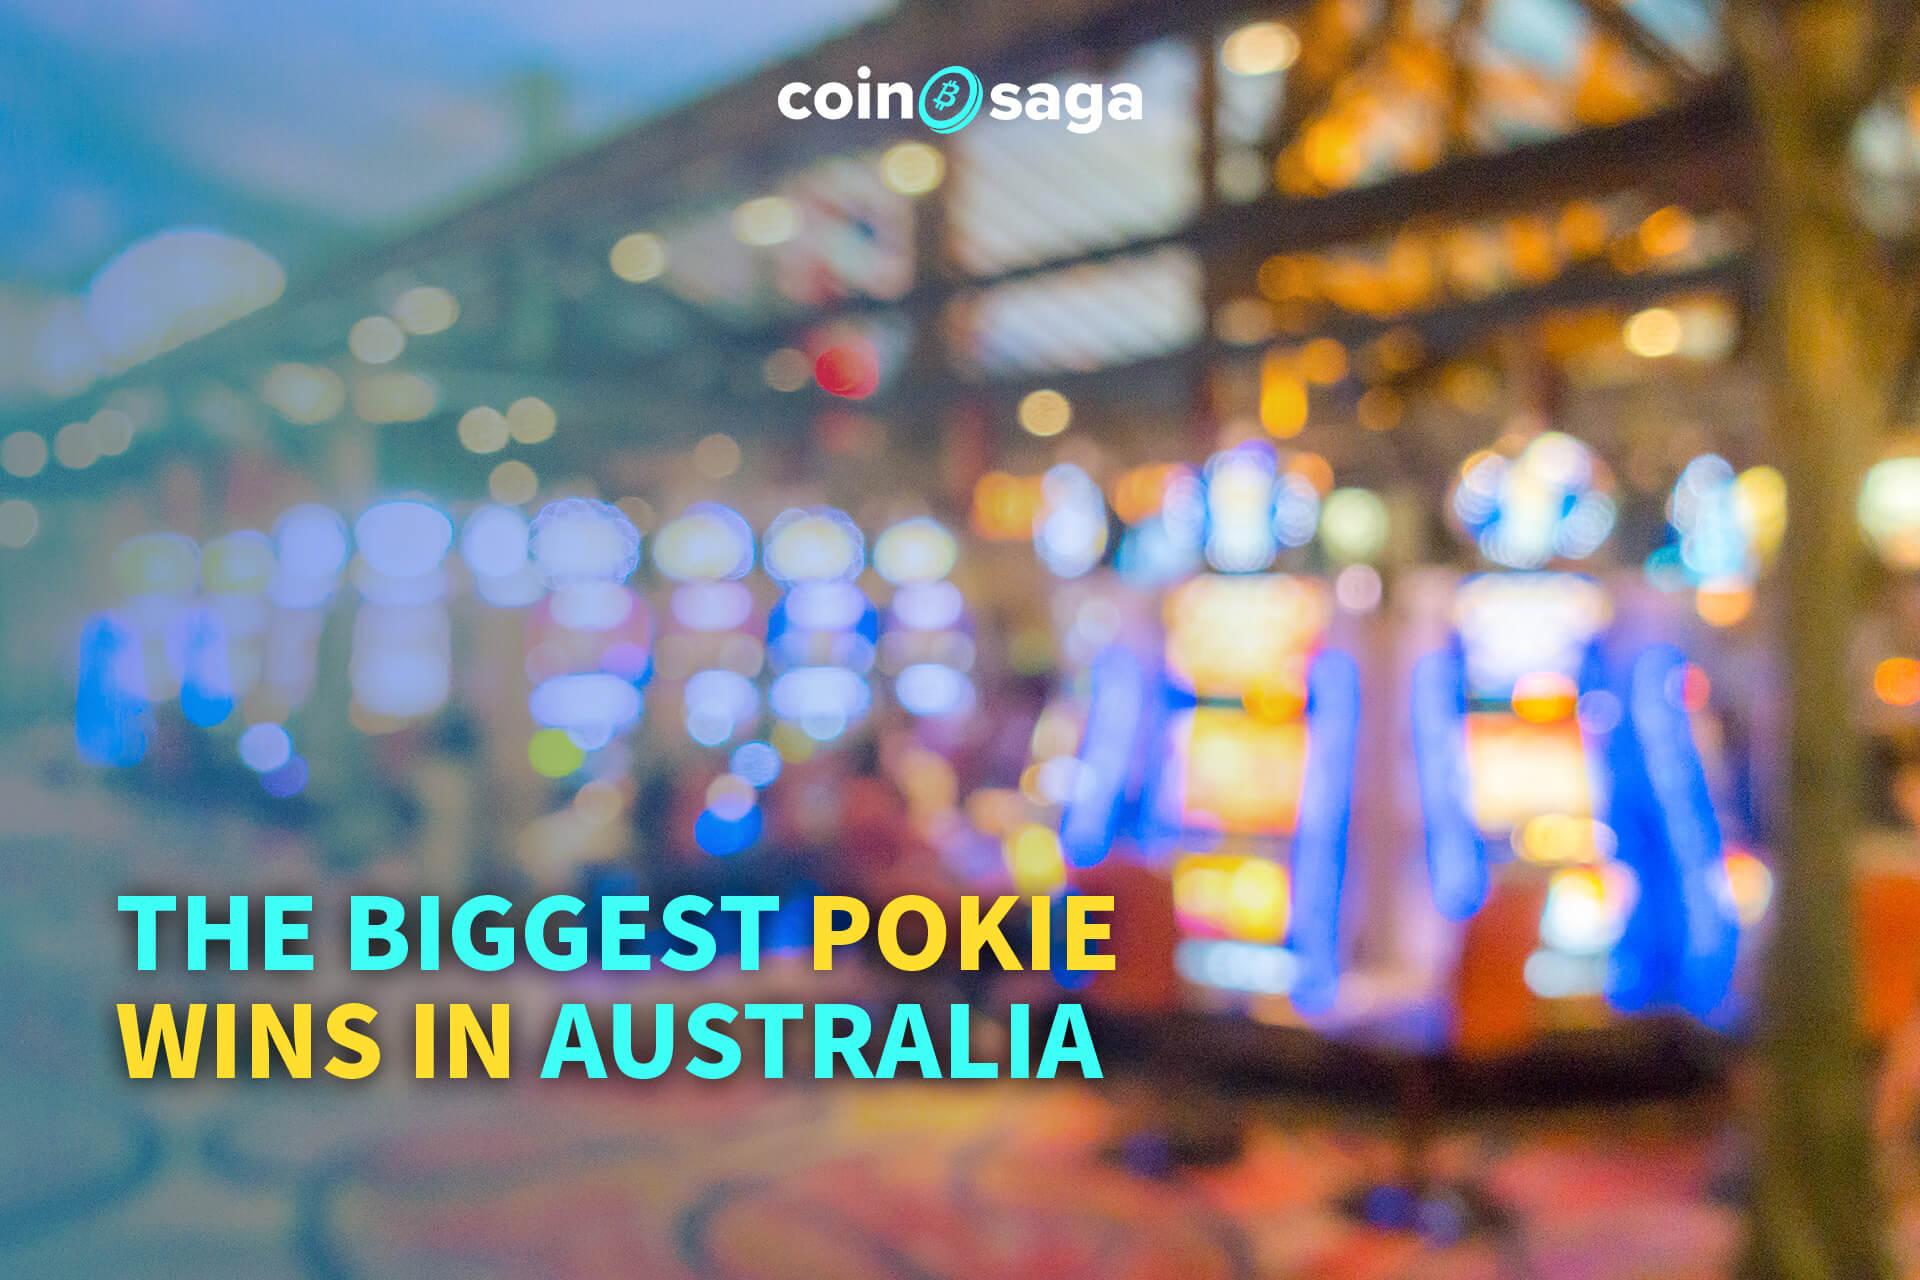 Pokie Wins in Australia